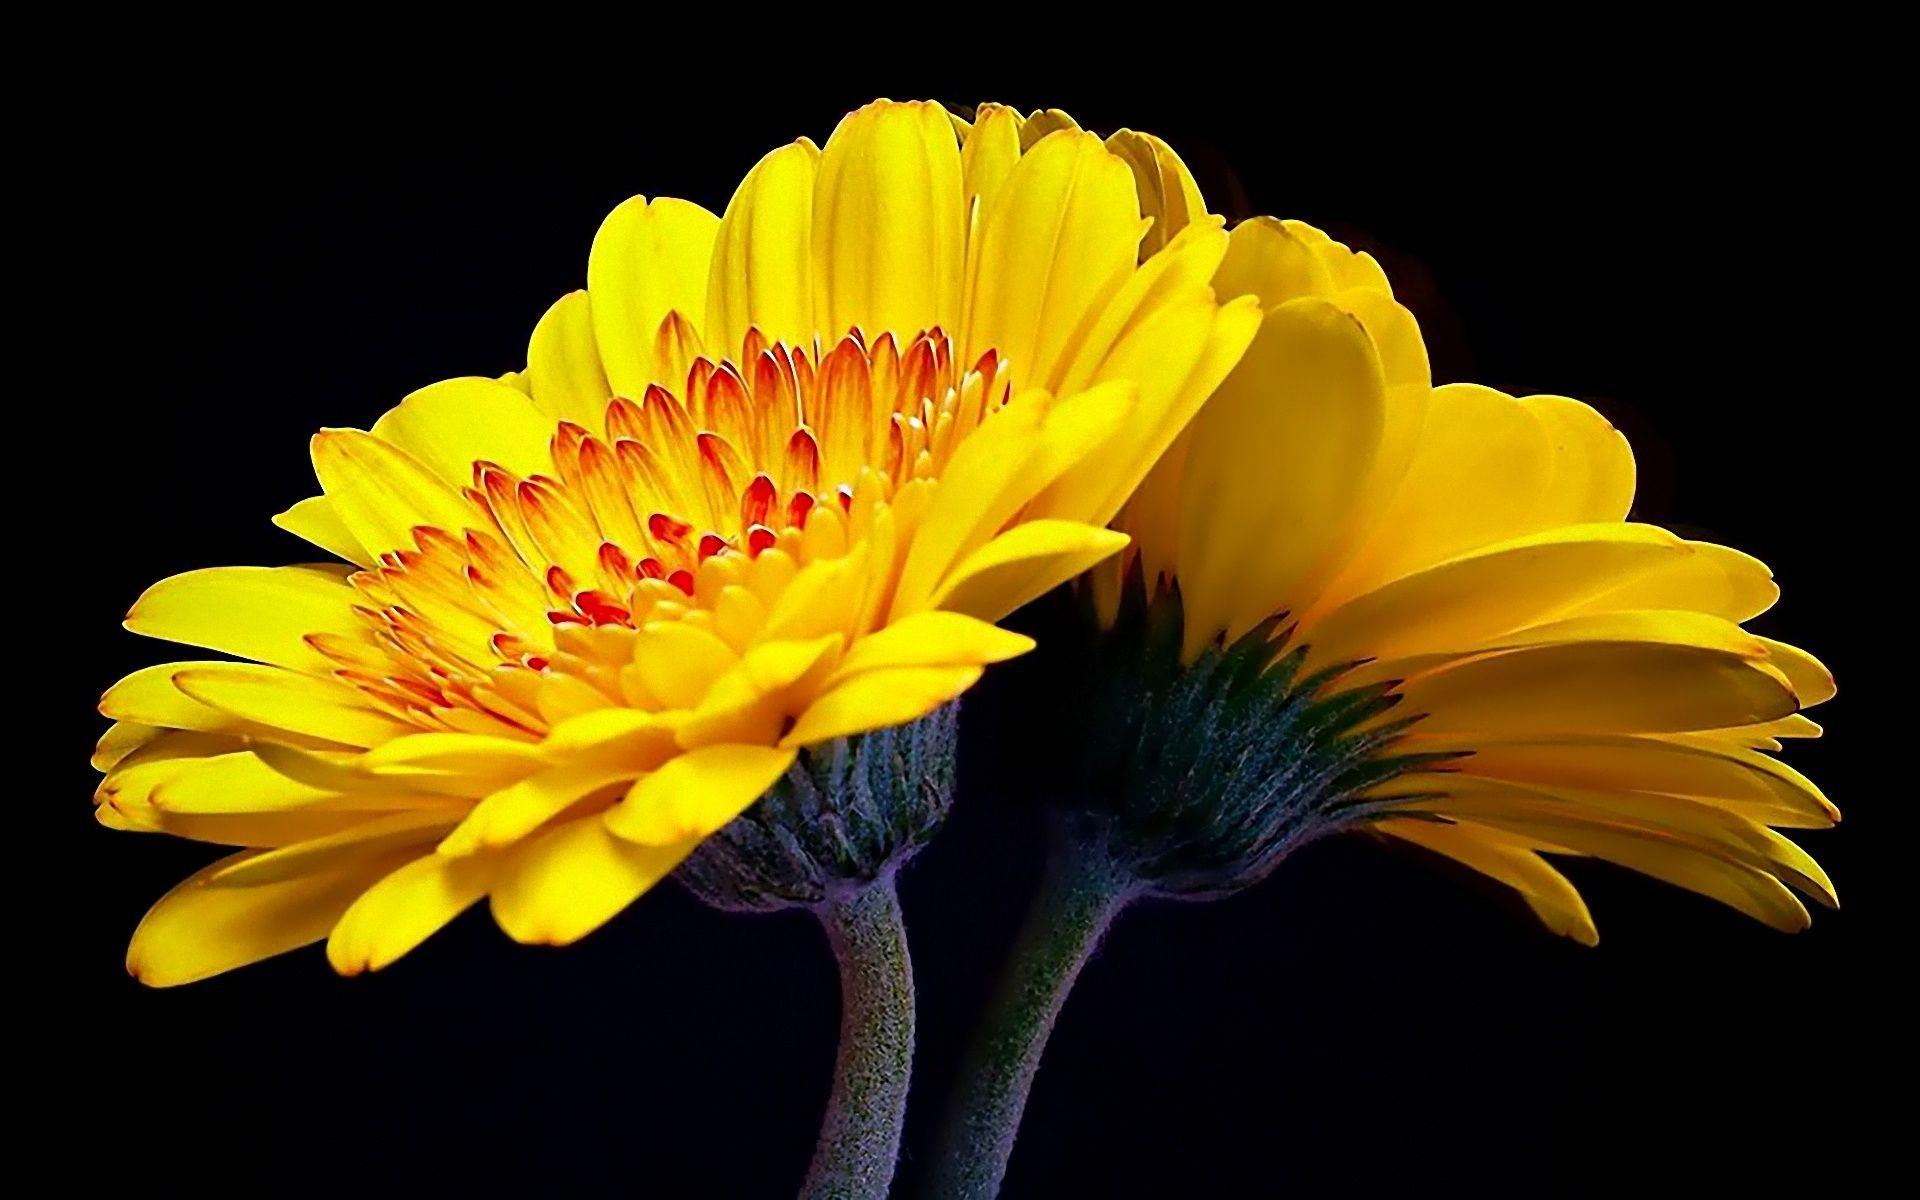 Hd wallpaper yellow flowers - Yellow Flowers Wallpapers